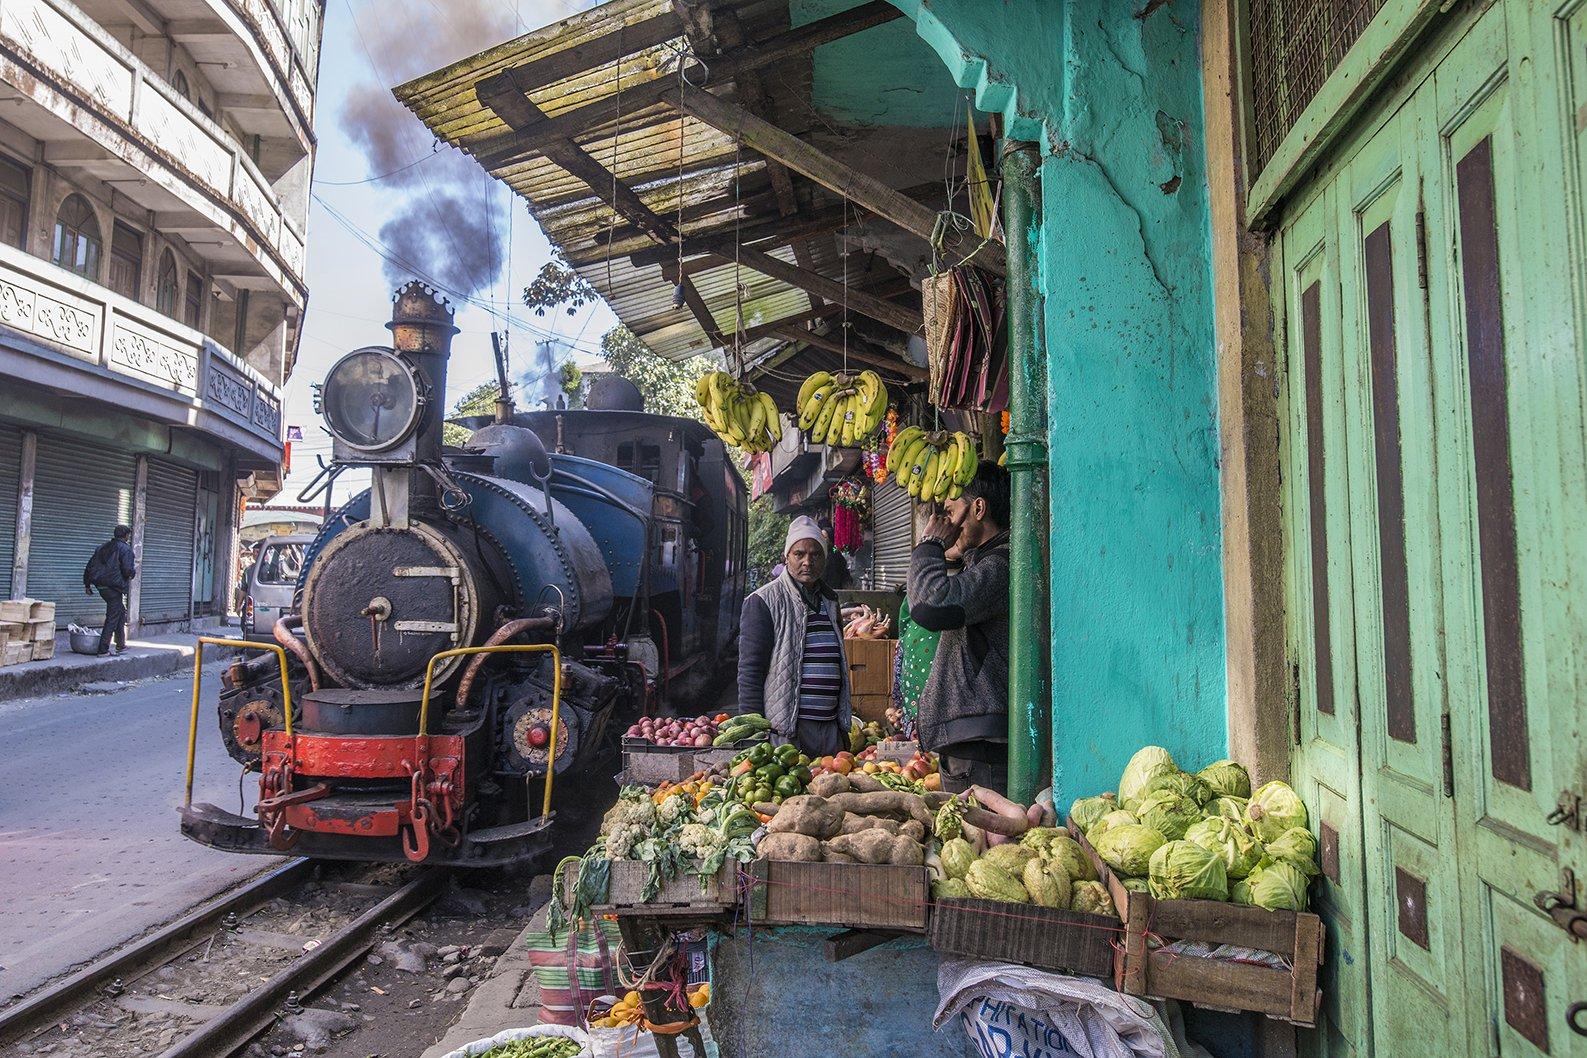 Toy train passing through a market in Darjeeling